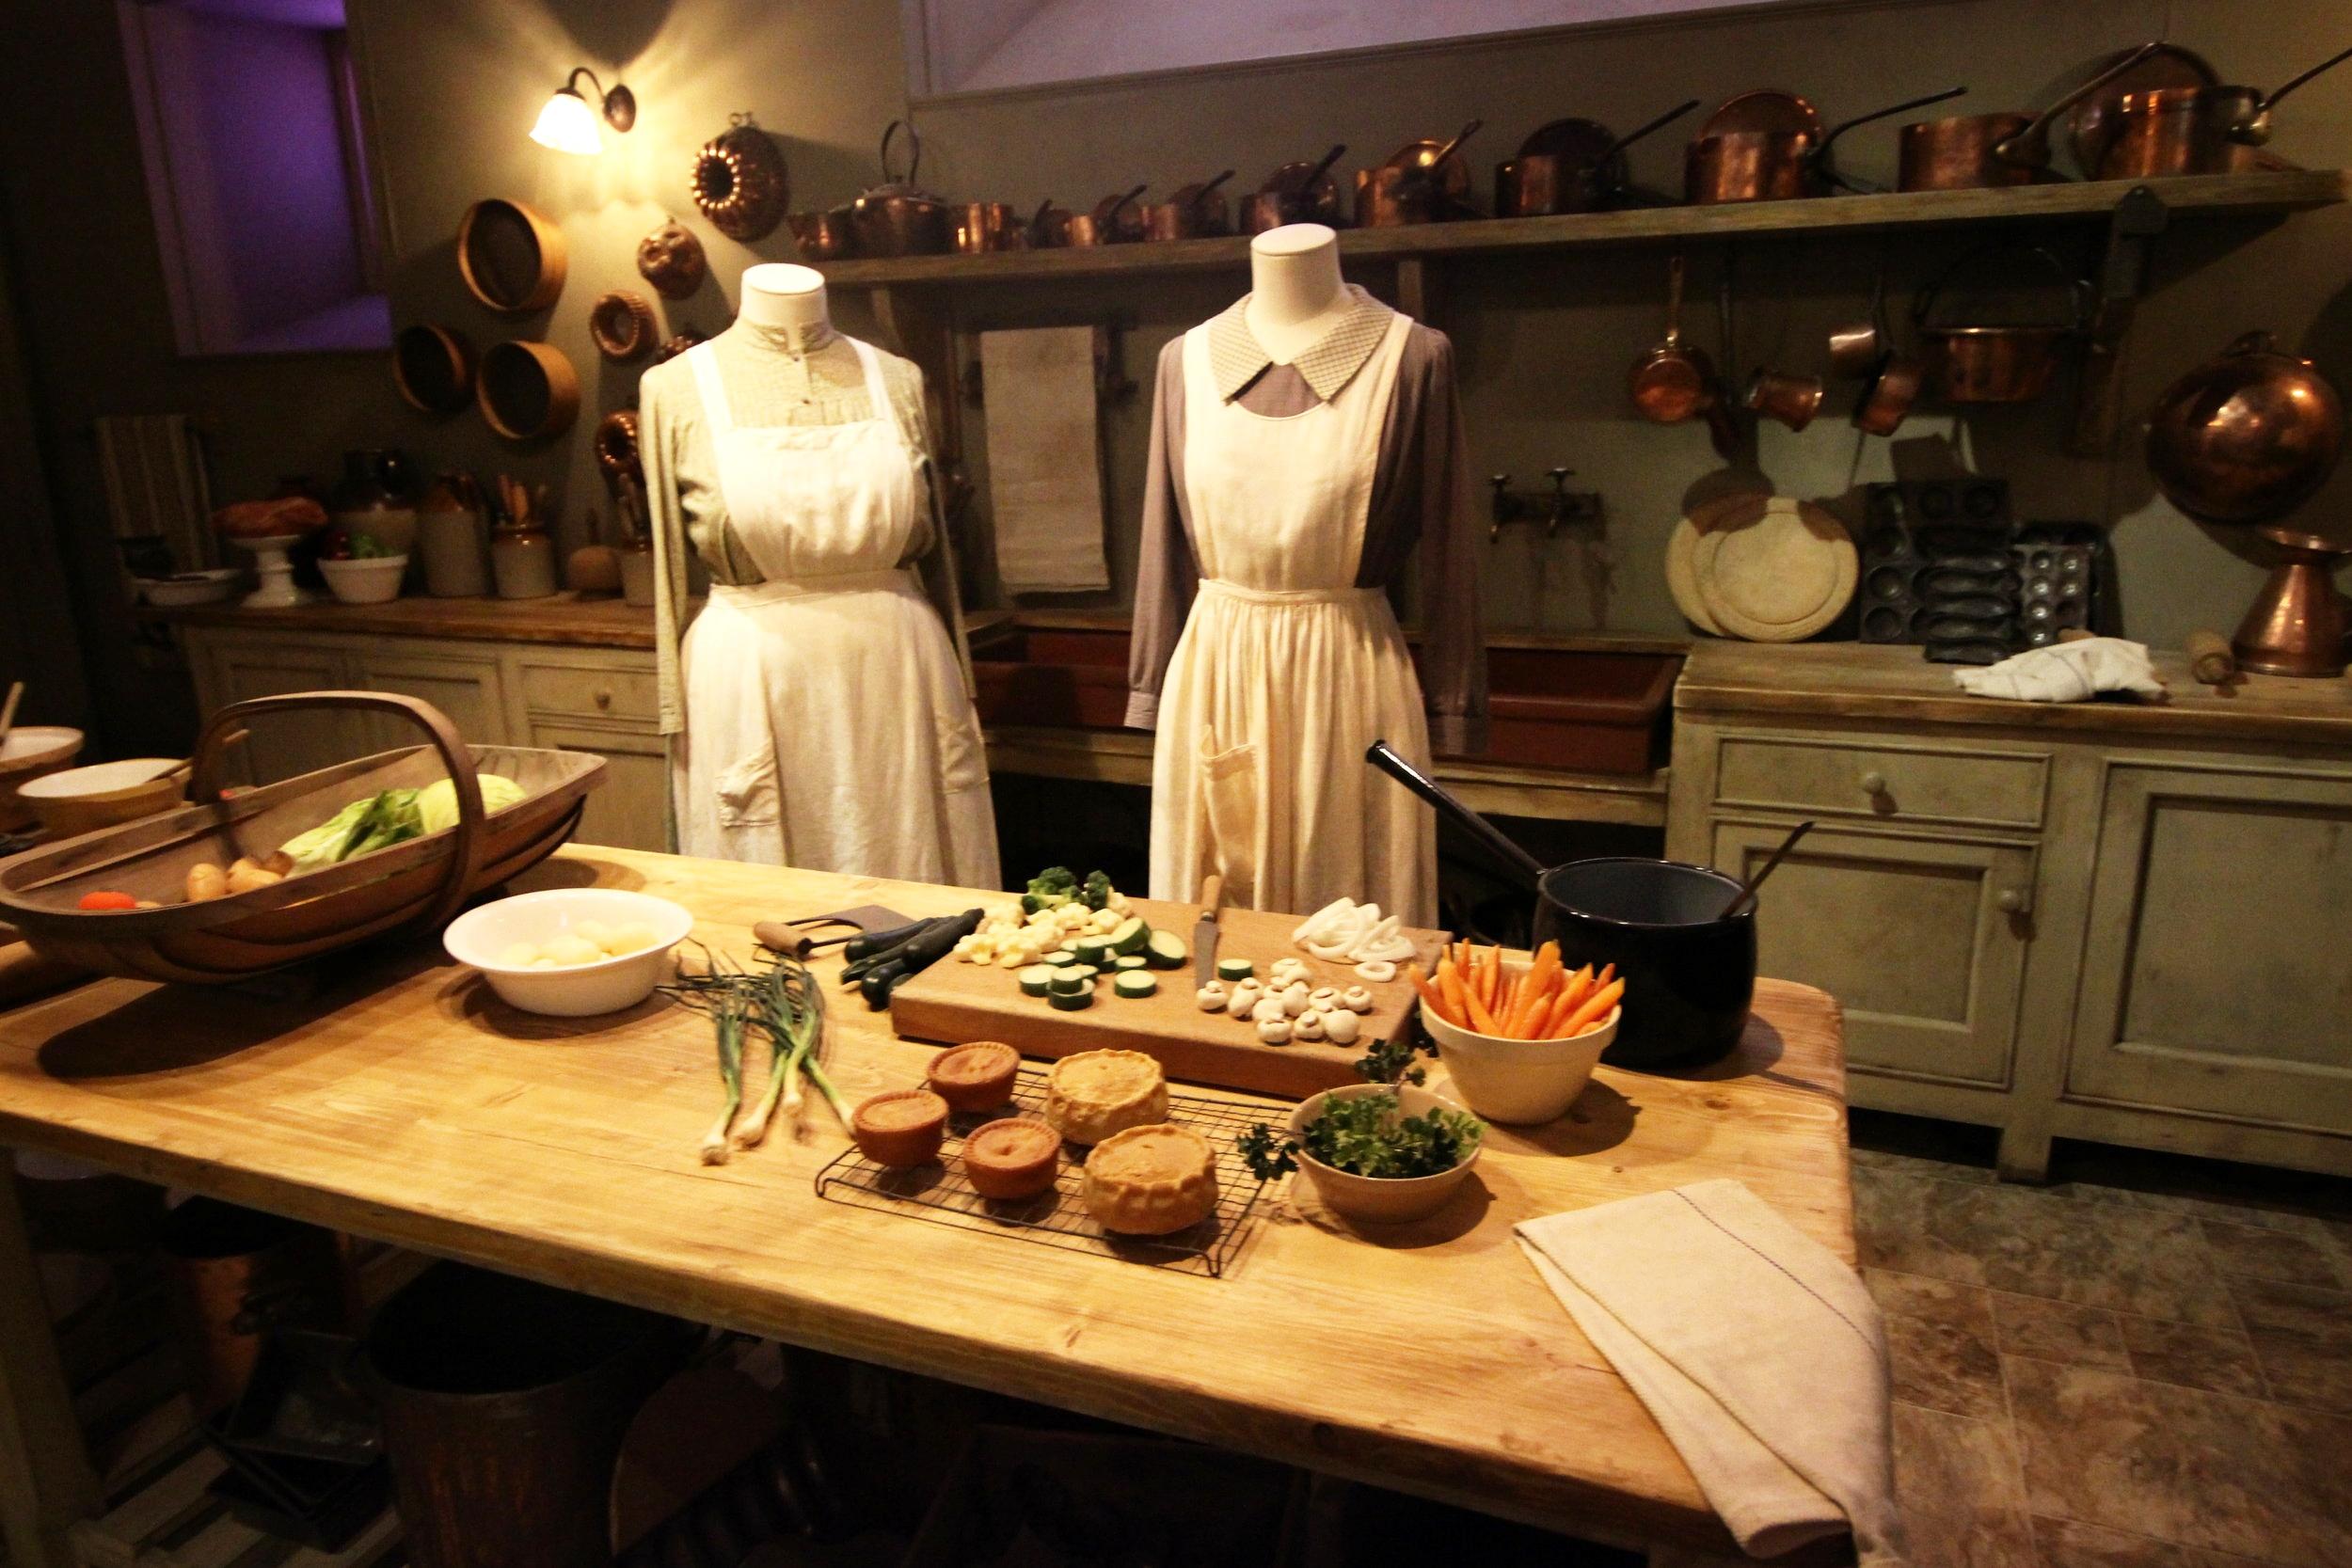 Mrs Patmore's kitchen